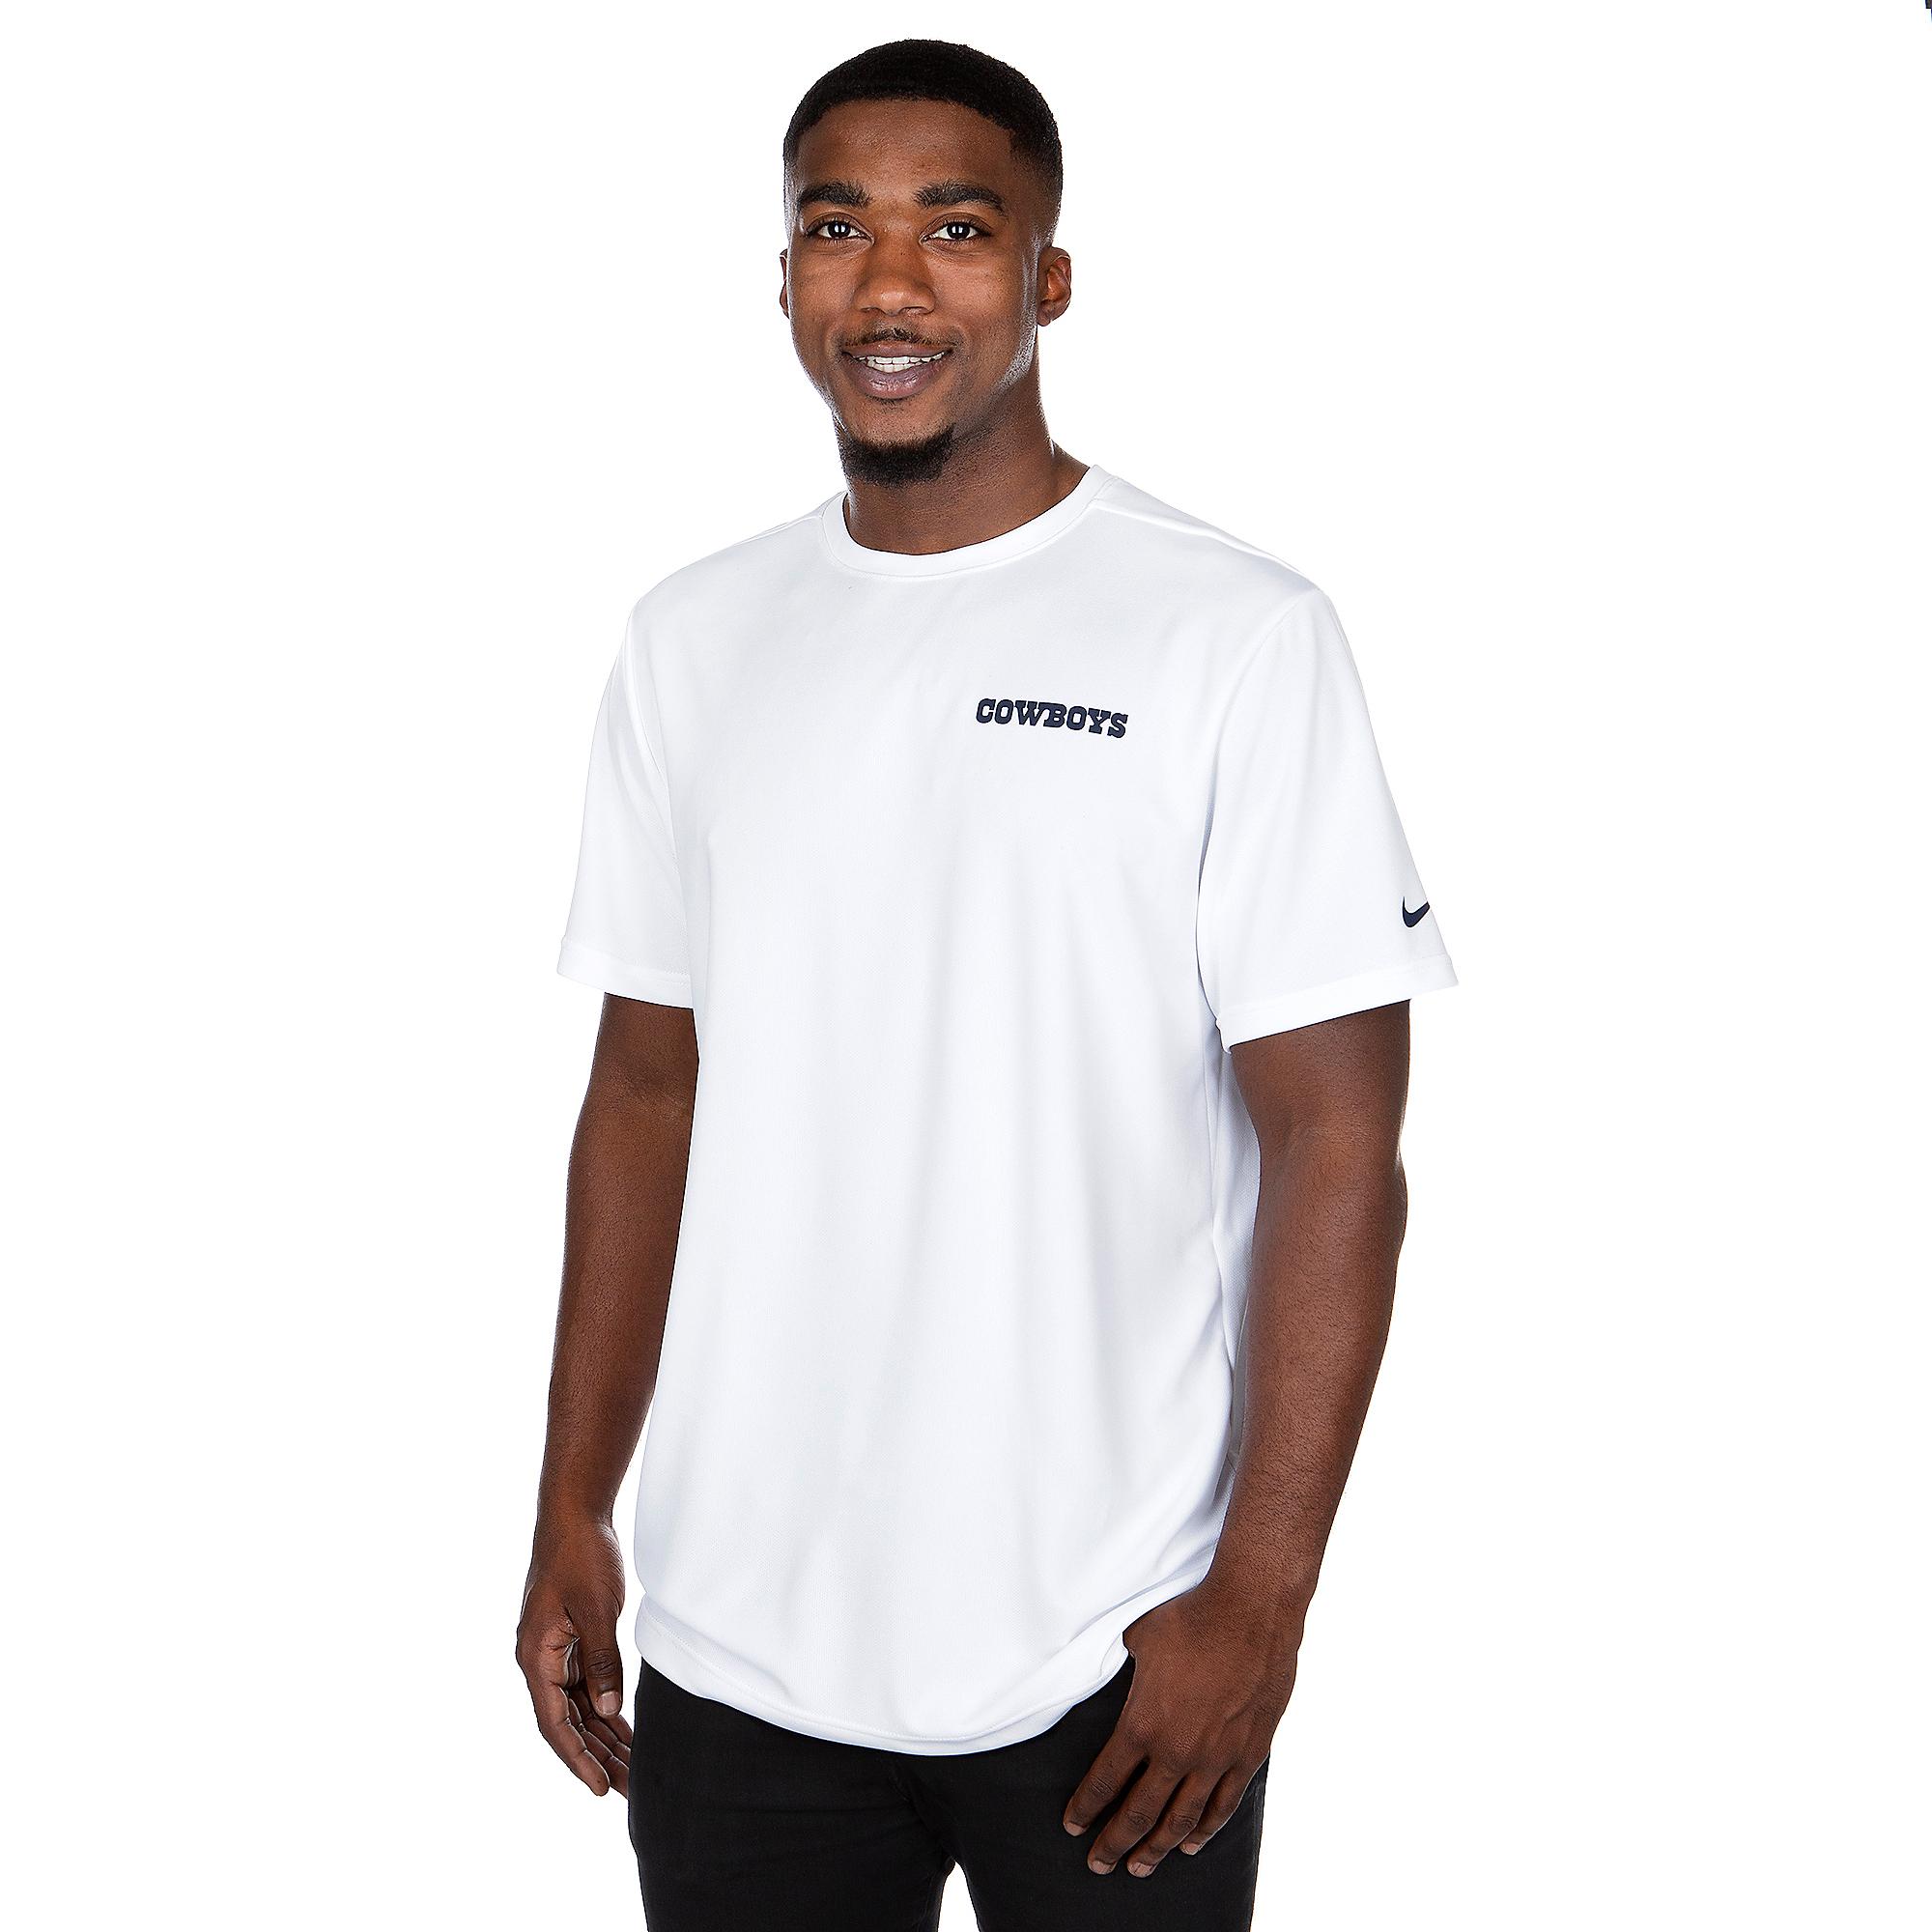 Dallas Cowboys Nike Mens Dri-FIT Coach Short Sleeve T-Shirt